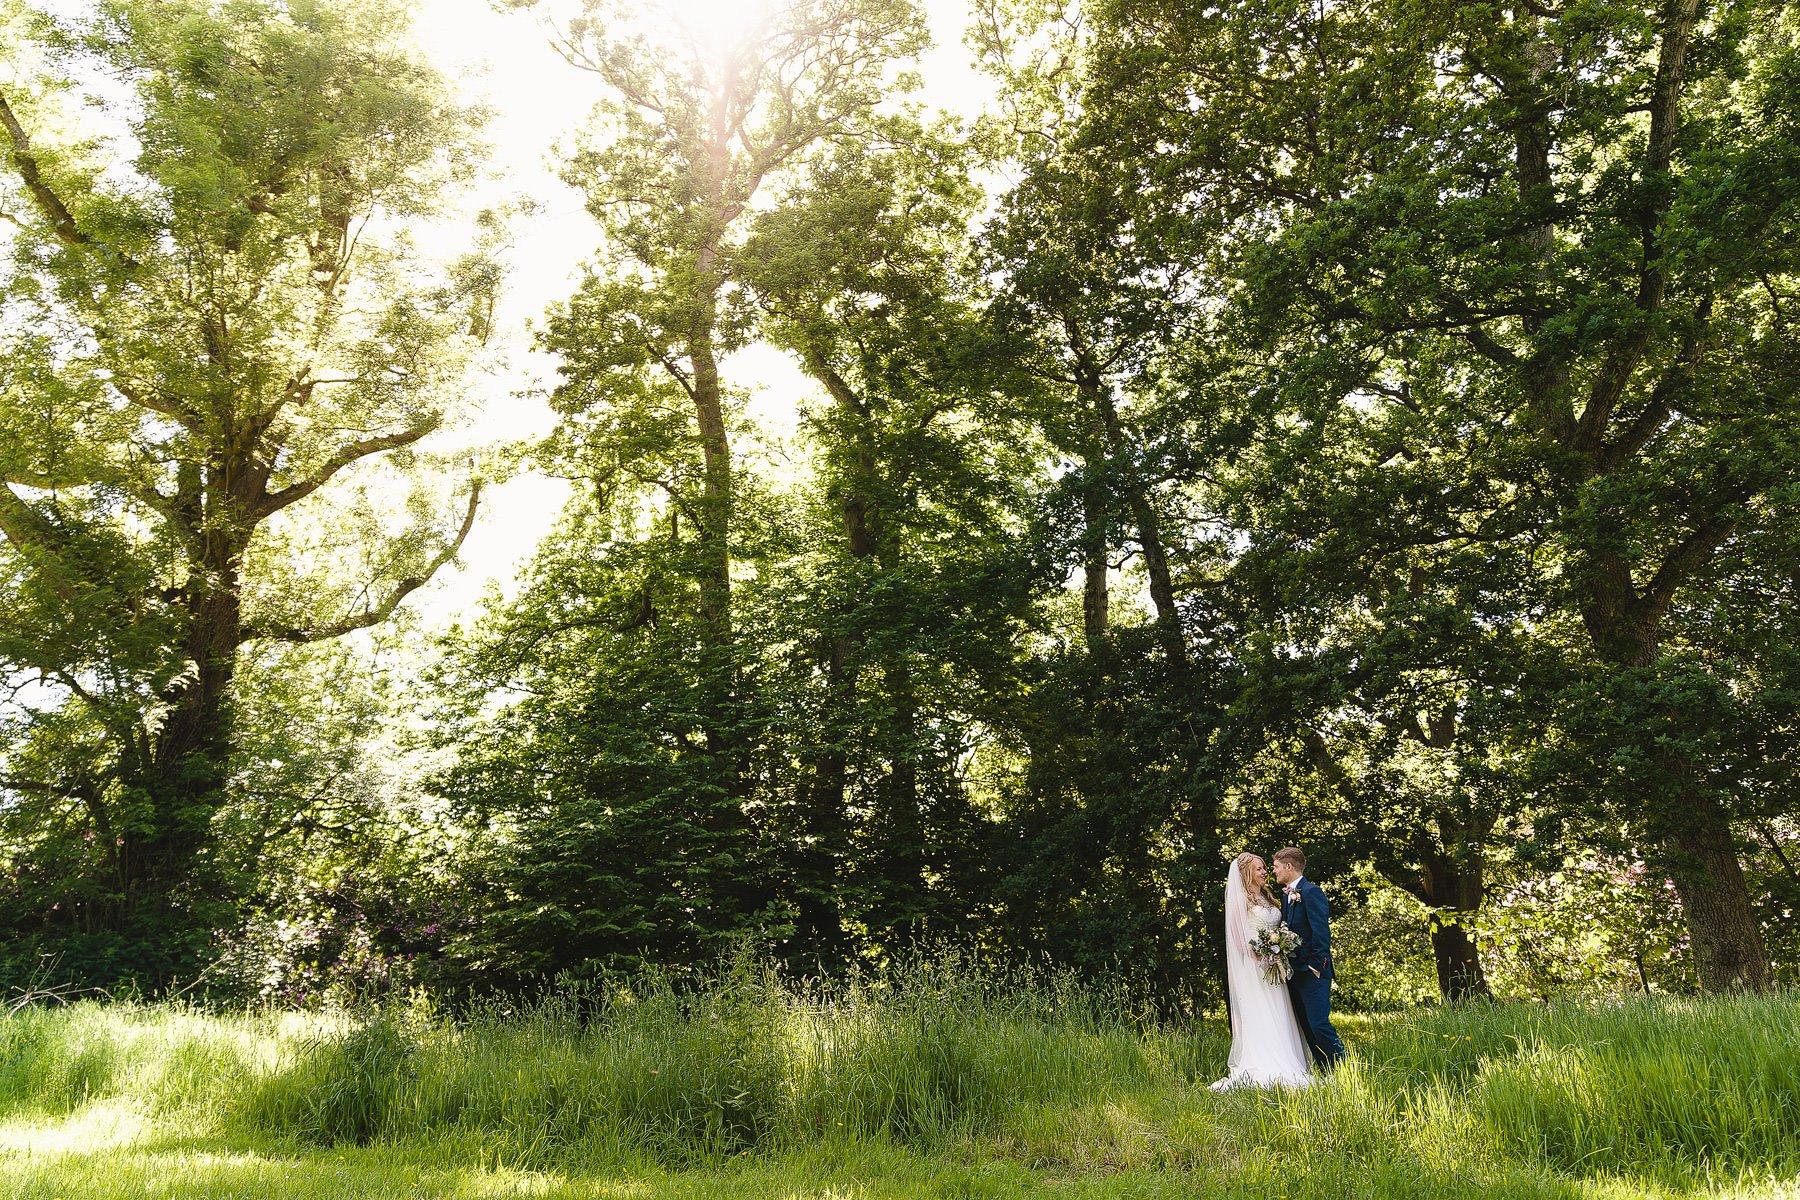 appuldurcombe house isle of wight wedding